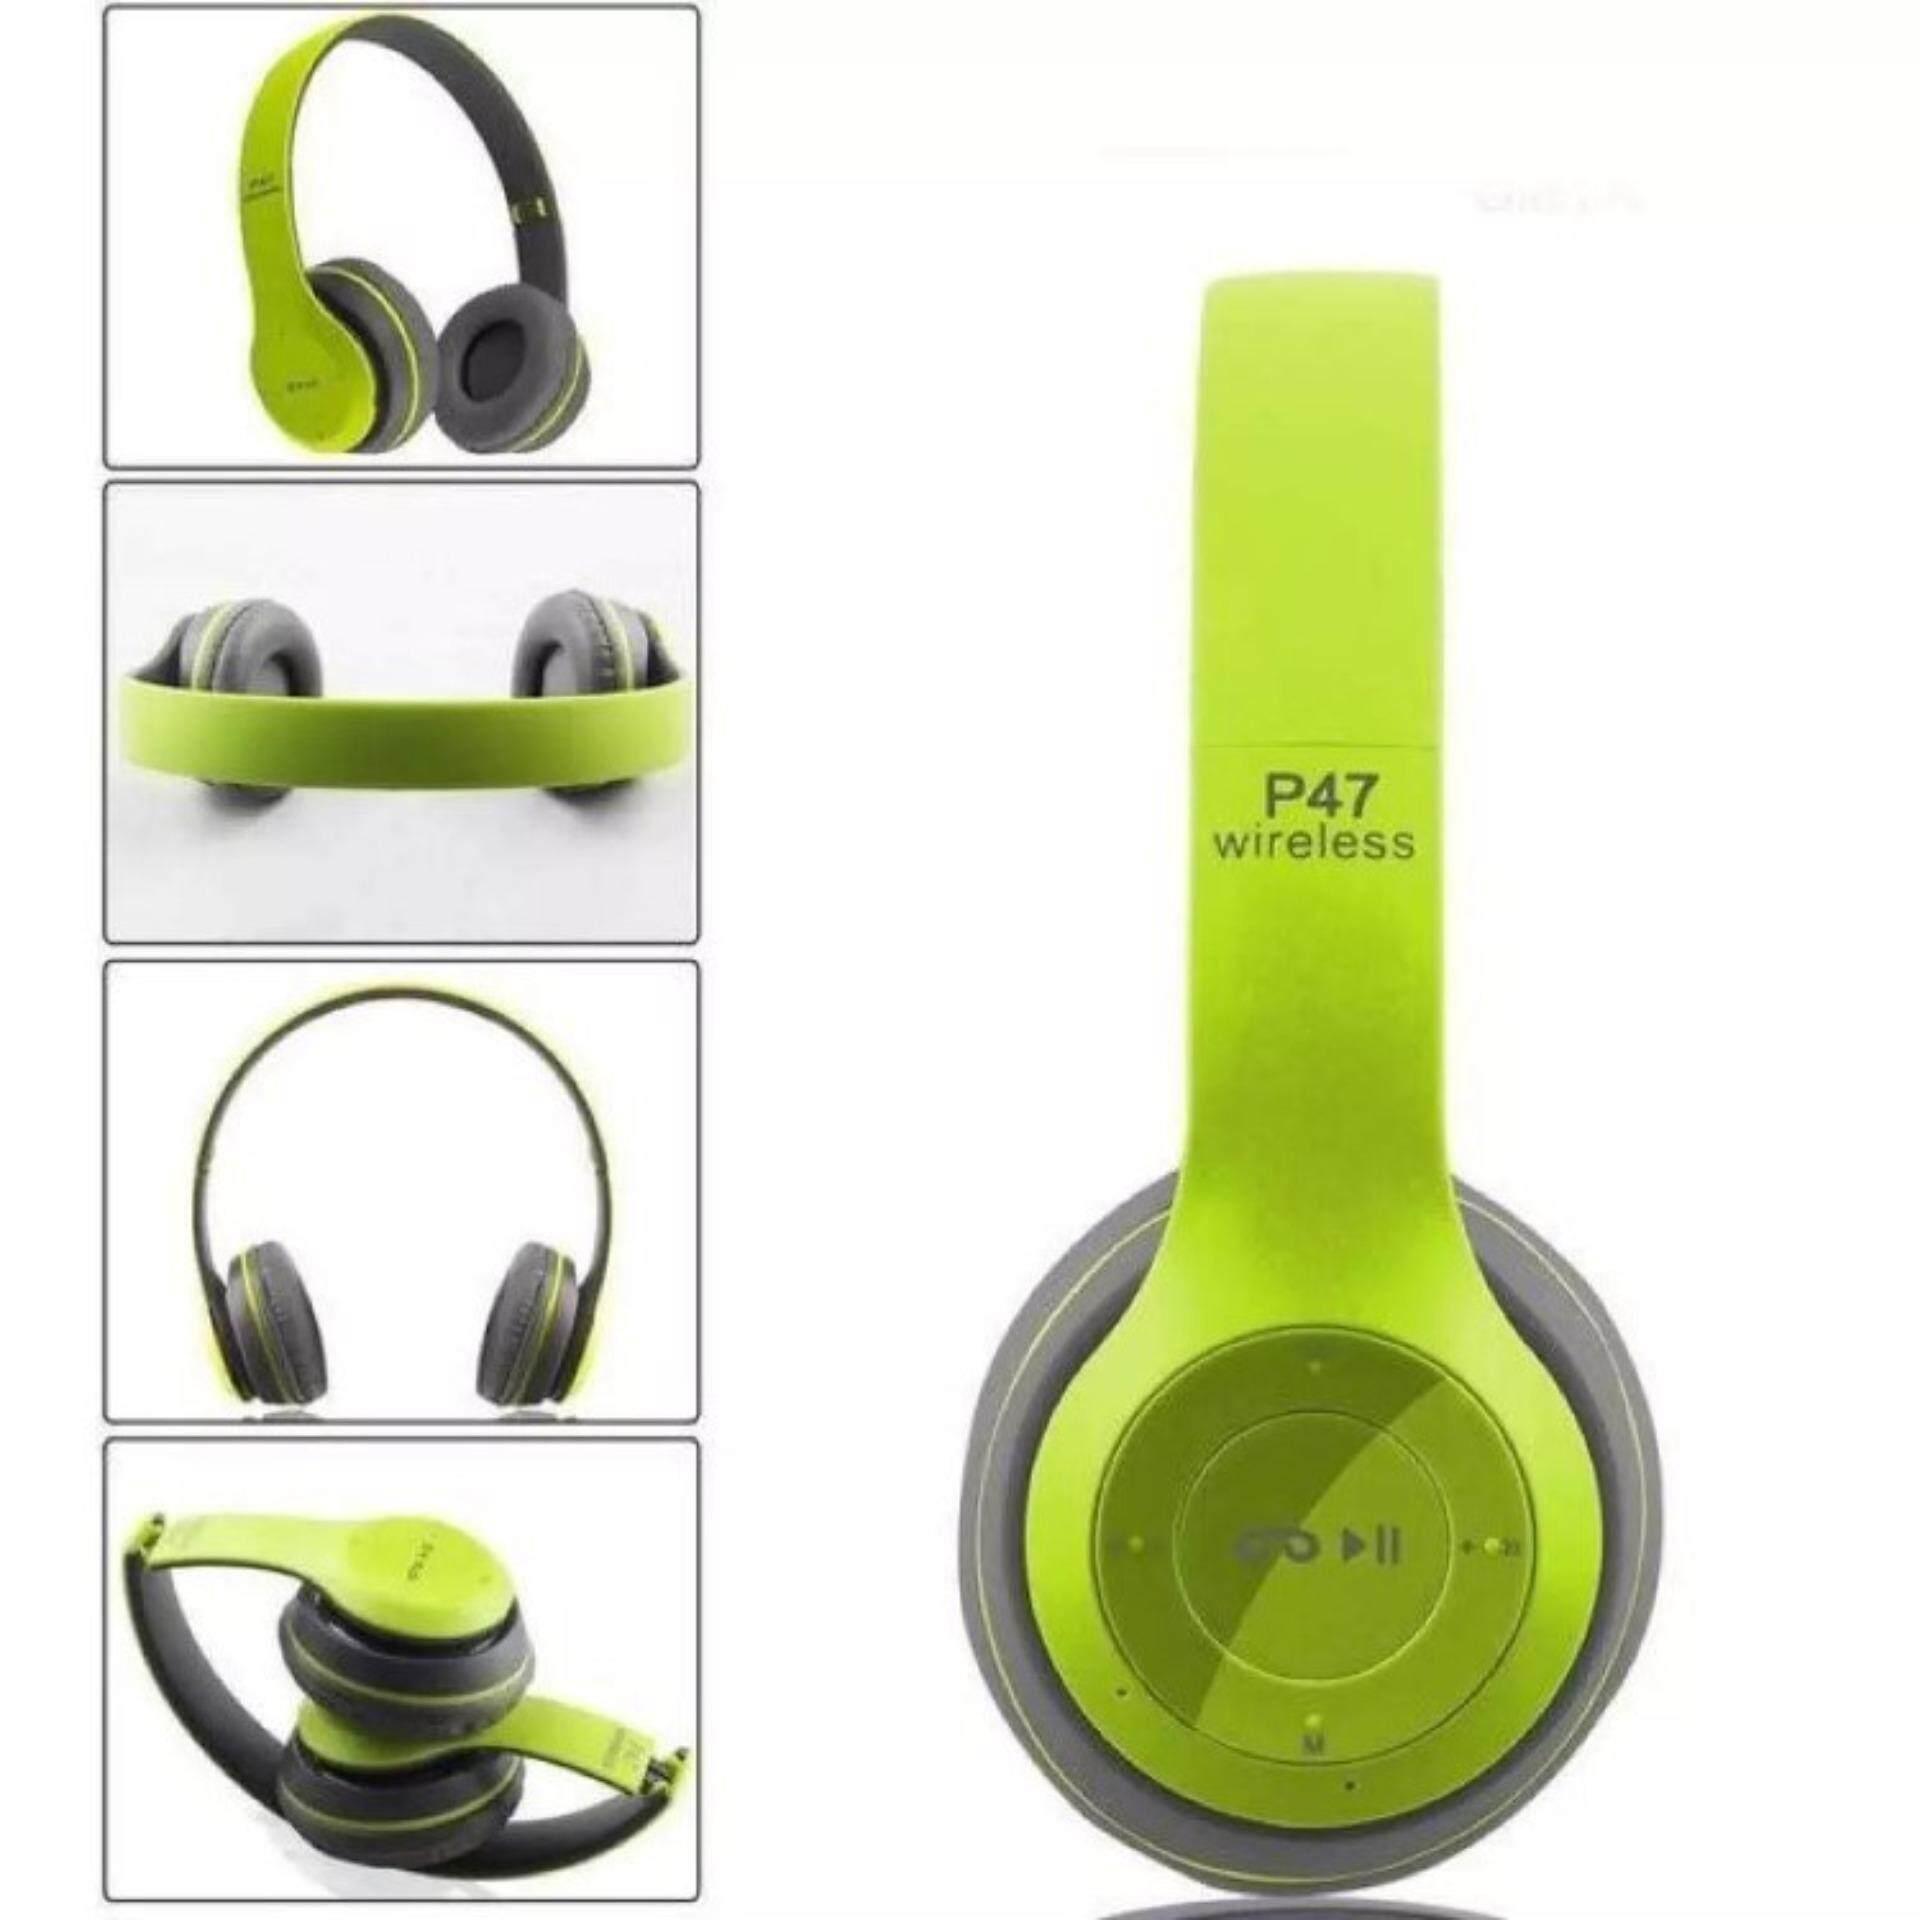 P47 Wireless 4.2+edr หูฟังบลูทูธแบบครอบหู.